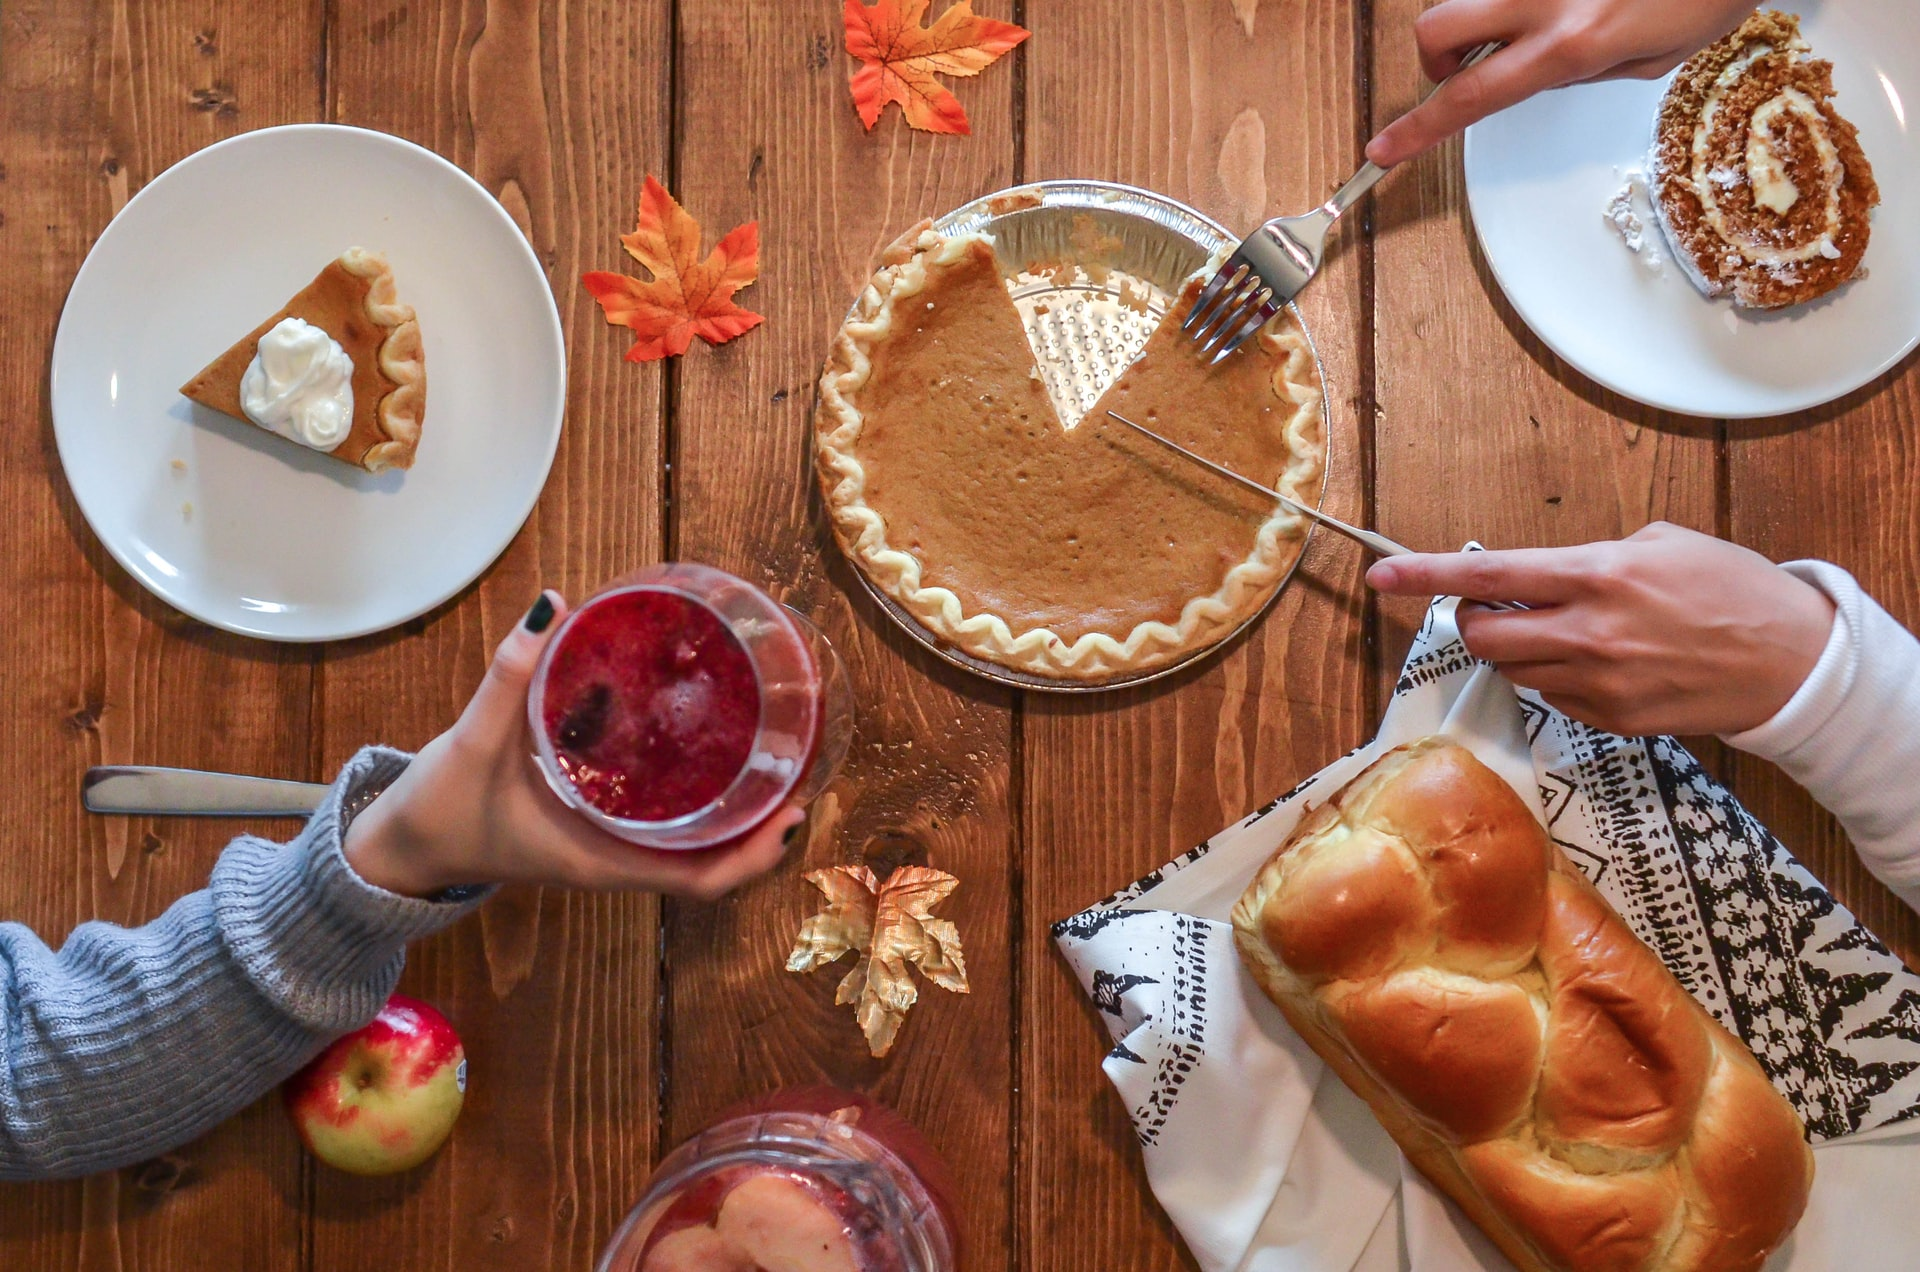 Slicing pumpkin pie beside bread at end of Thanksgiving dinner - Source: Element5 Digital via Unsplash - https://unsplash.com/photos/RPjyNMHDrFY